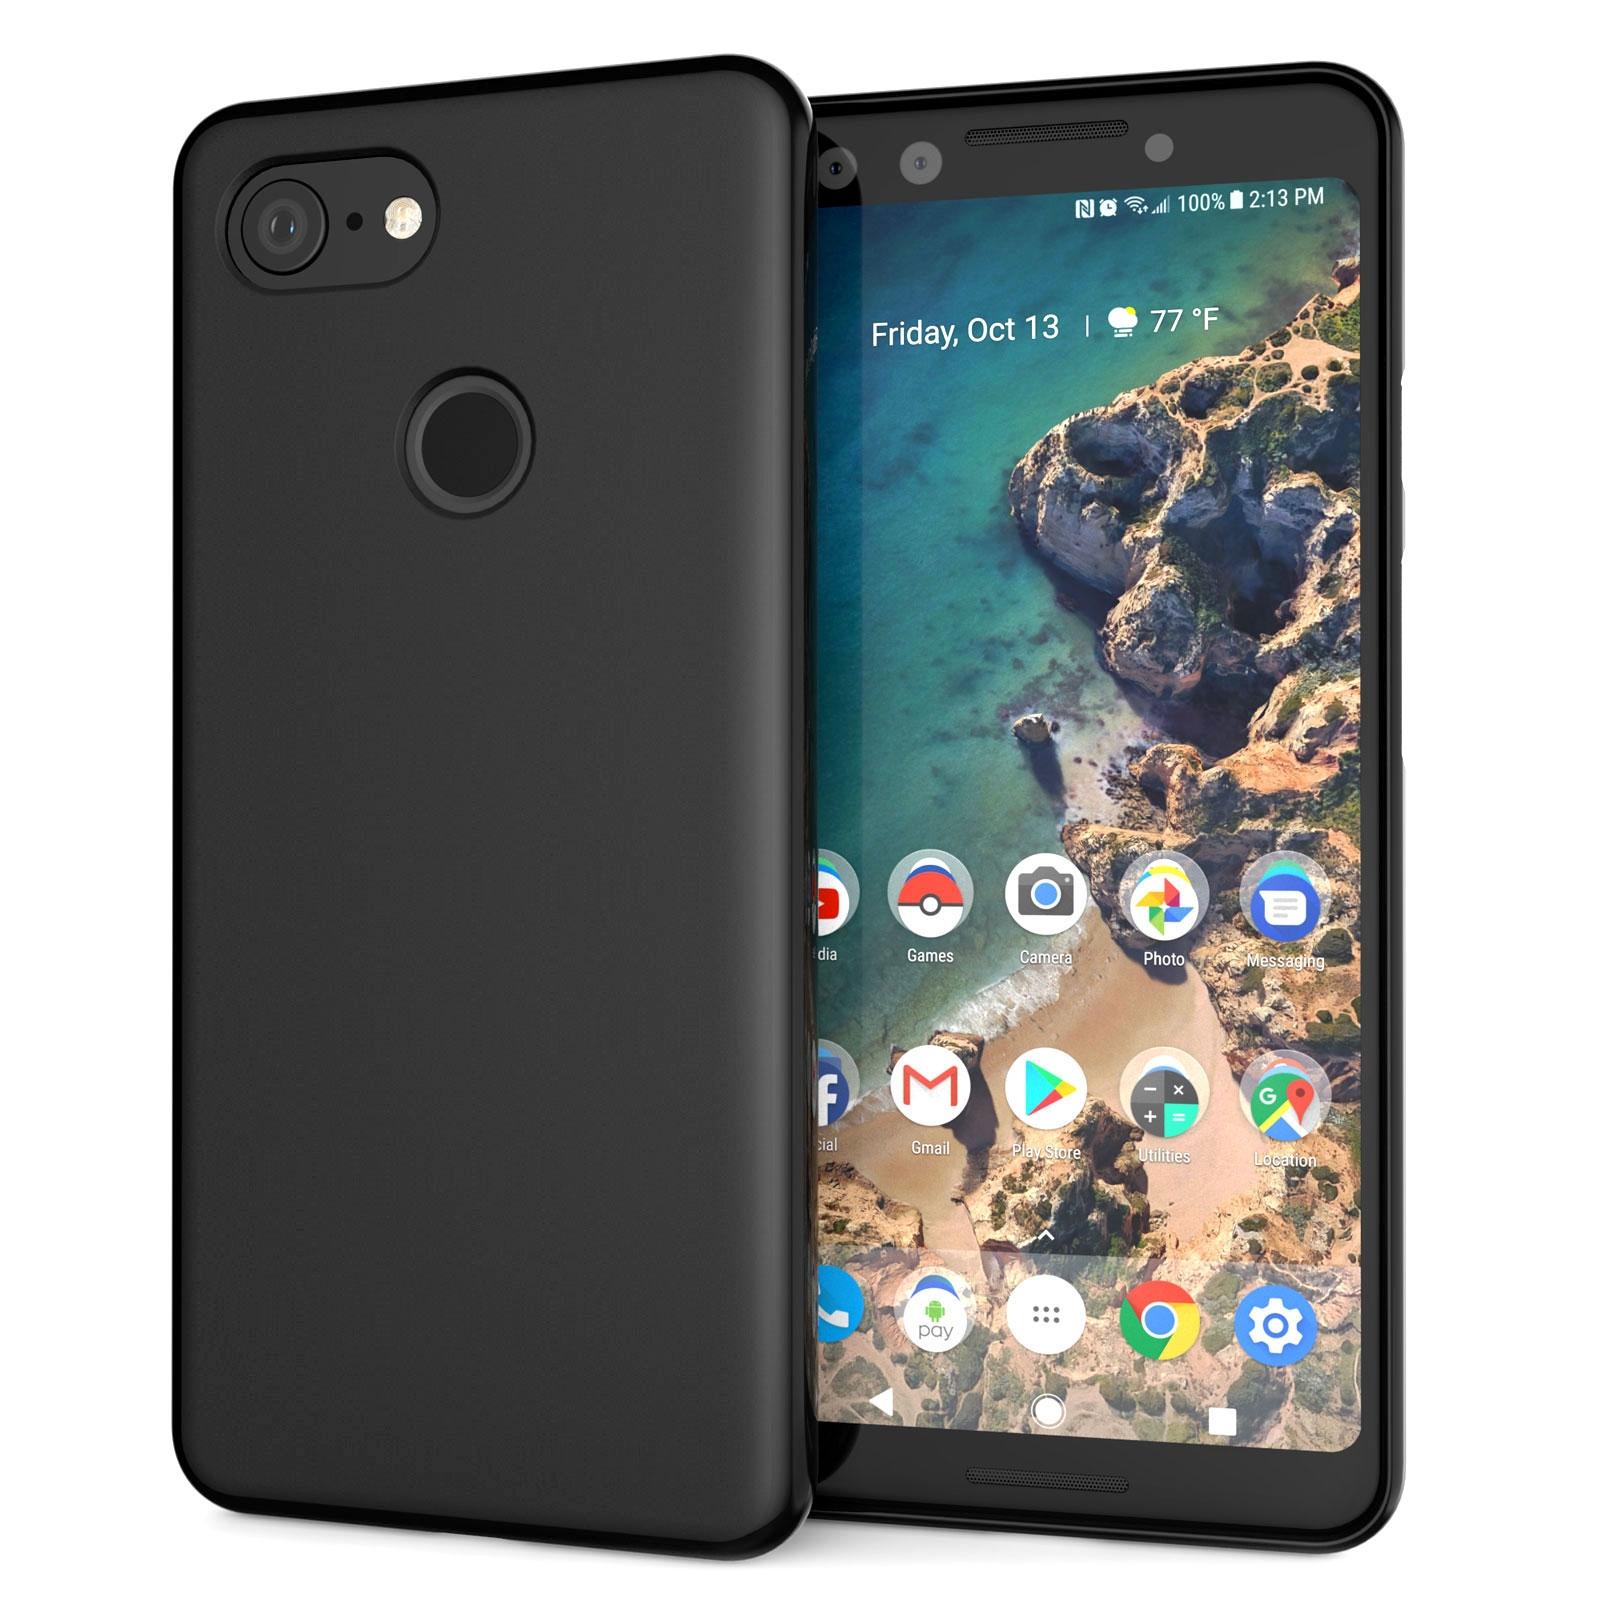 Caseflex Θήκη Σιλικόνης Google Pixel 3 - Black (CS000003GO)